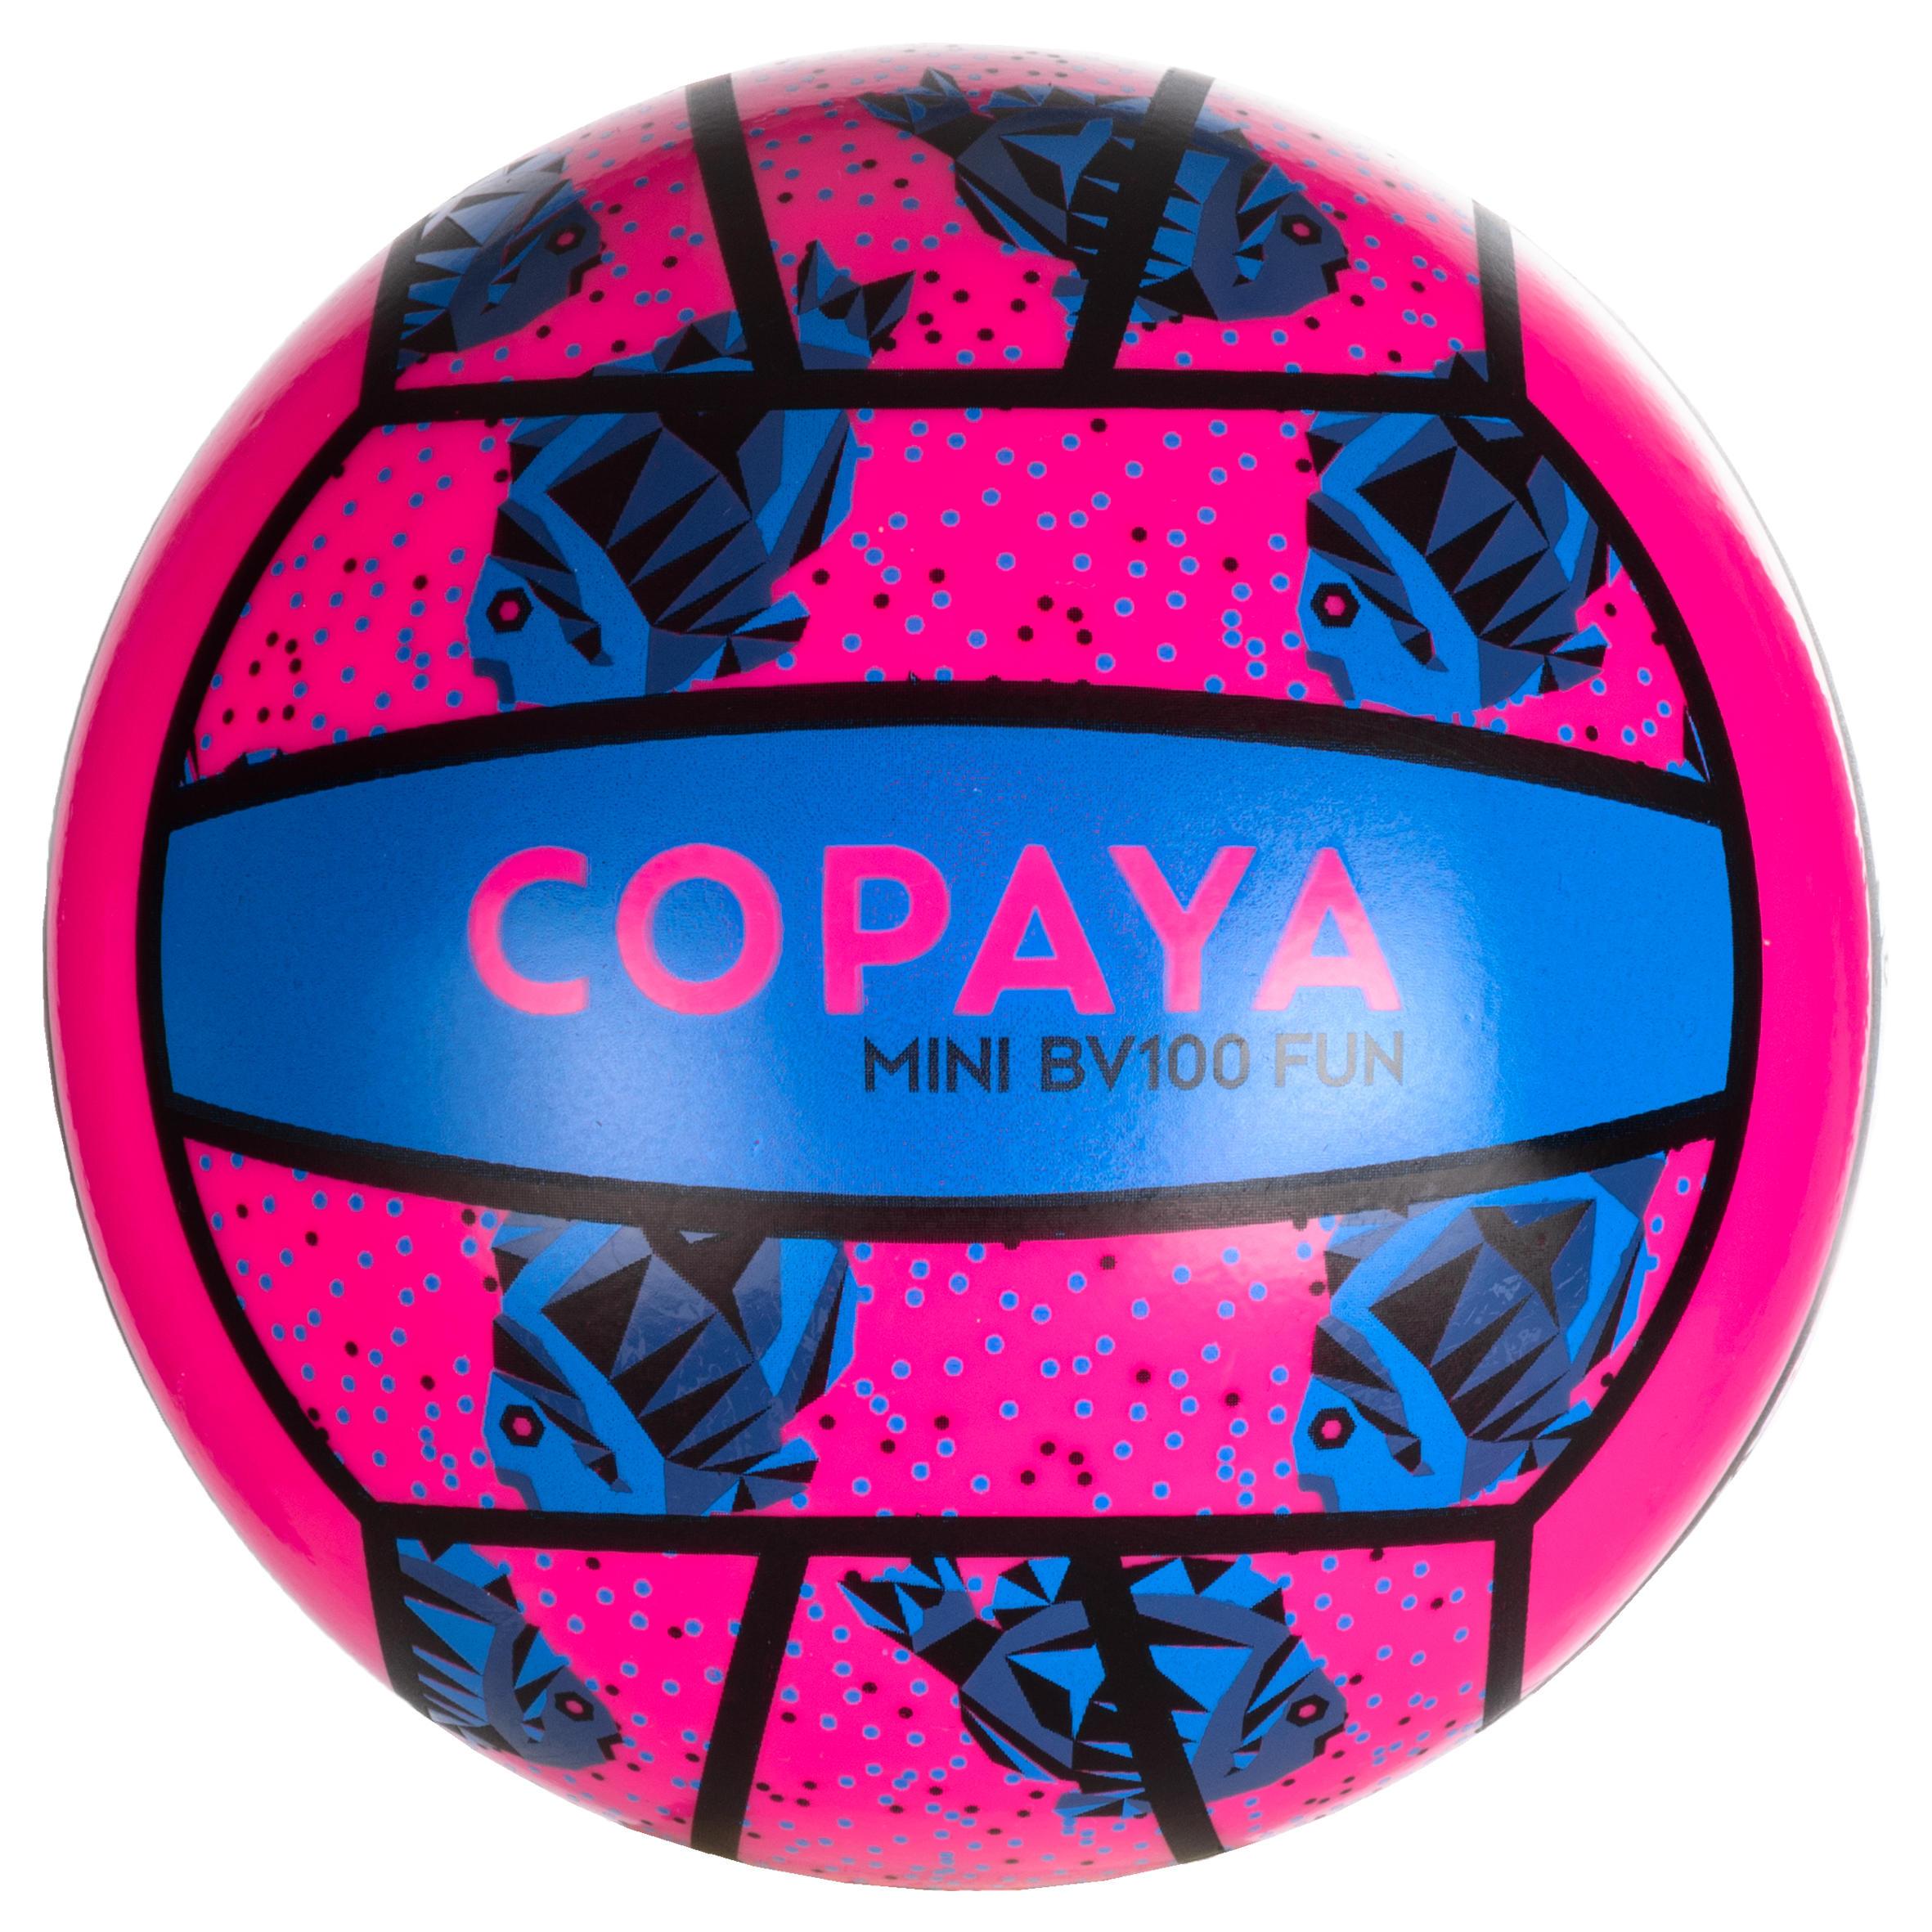 Copaya Mini Beachvolleybal BV100 maat 1